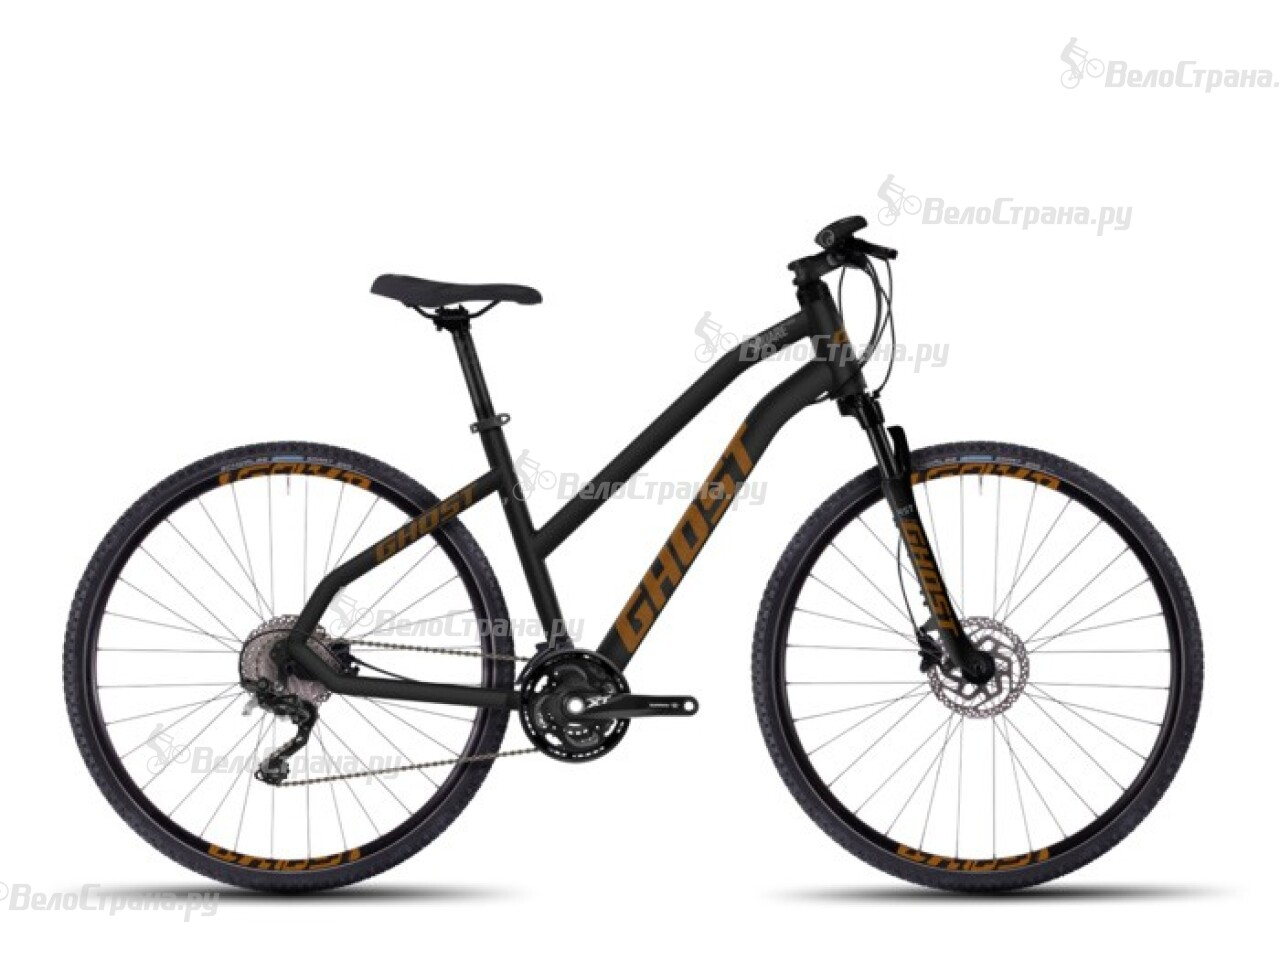 Велосипед Ghost SQUARE Cross 6 Miss (2016) велосипед ghost square cross x 2 2016